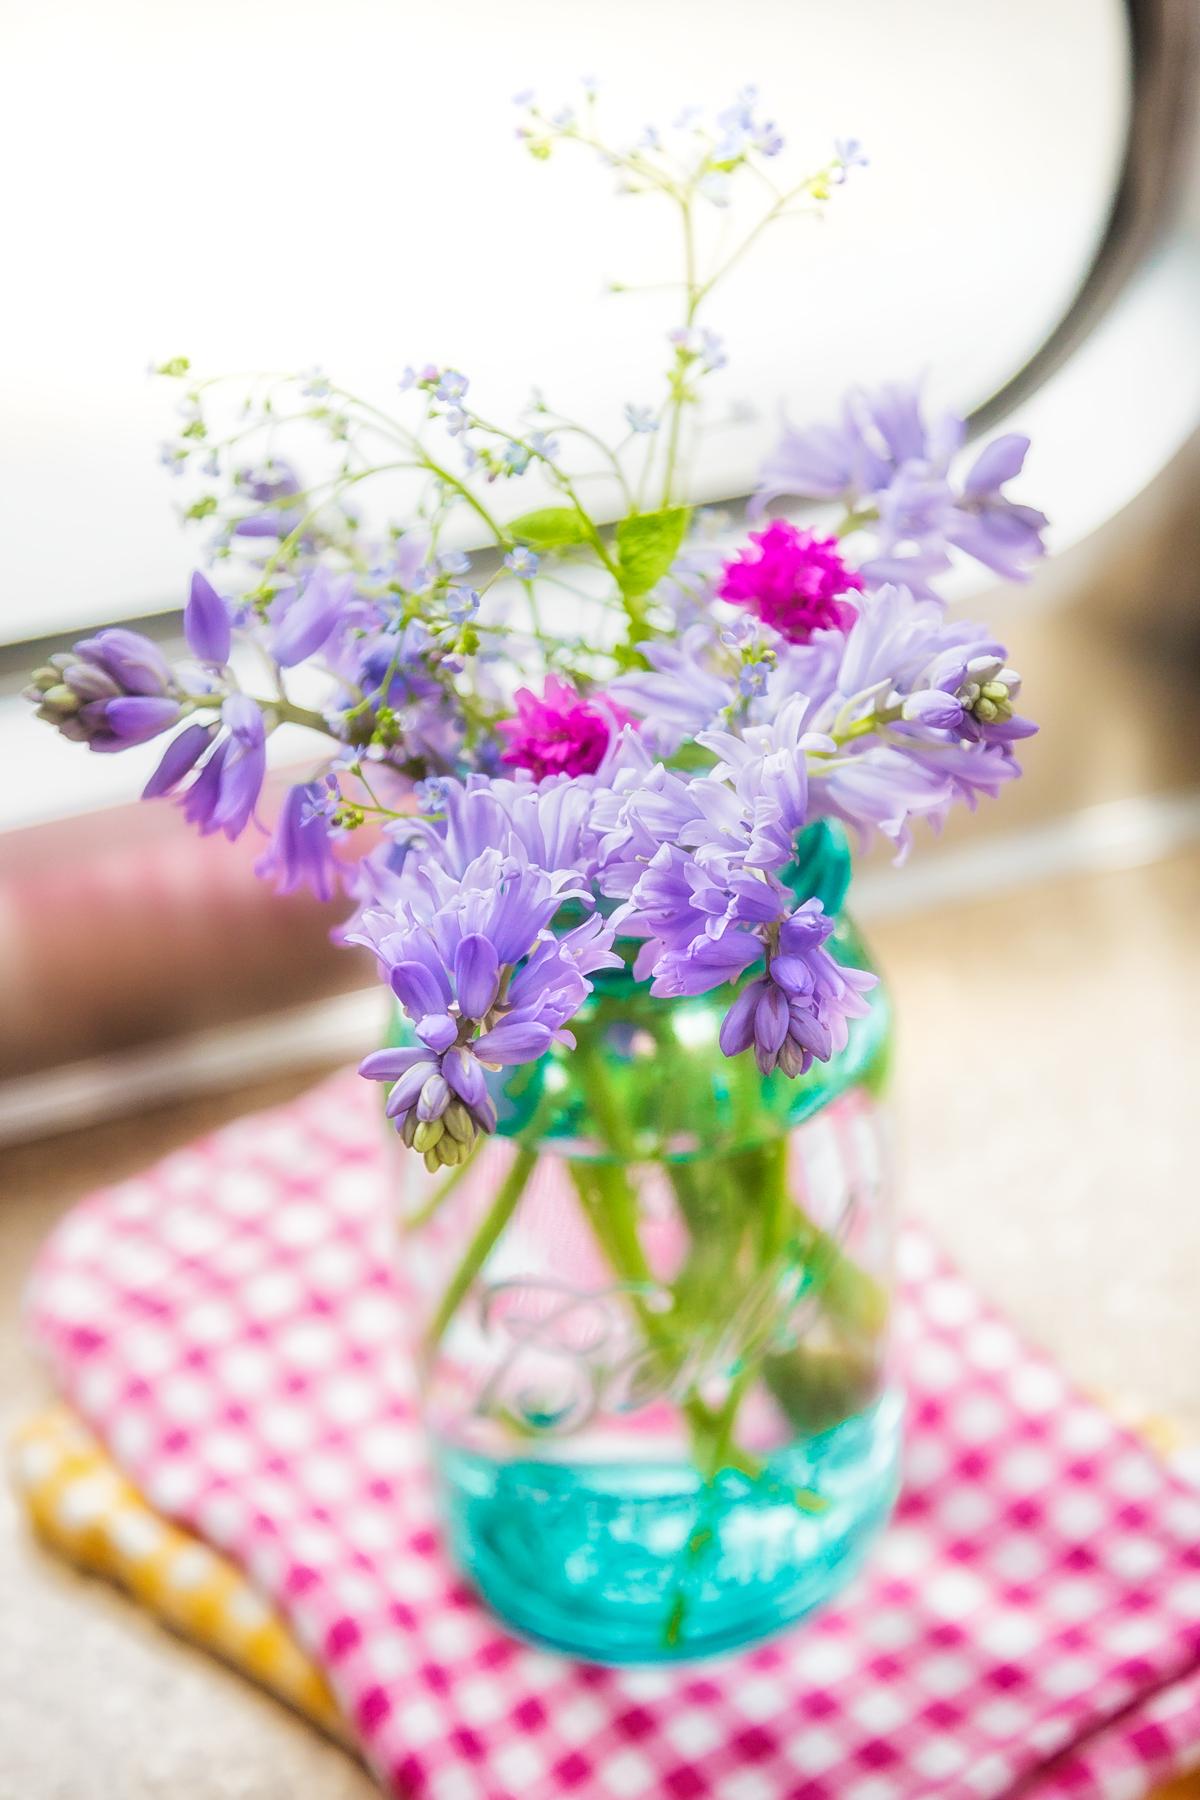 Spring Flowers in Blue Ball Mason Jar via J5MM.com #Airstream